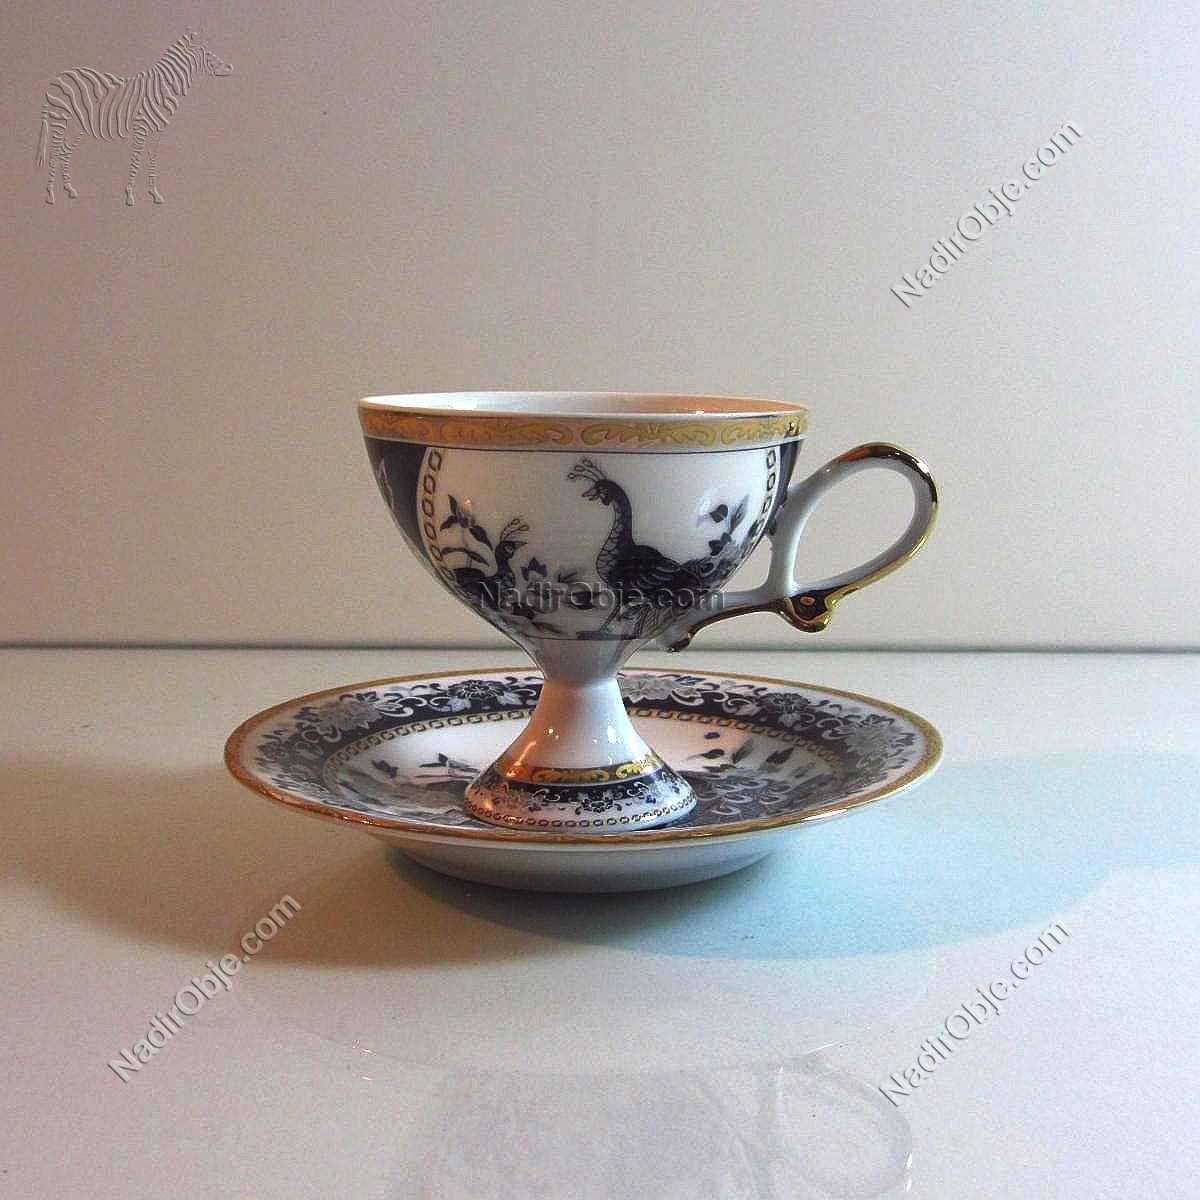 Porselen Kahve Fincanı Seramik-Porselen Objeler Fincan